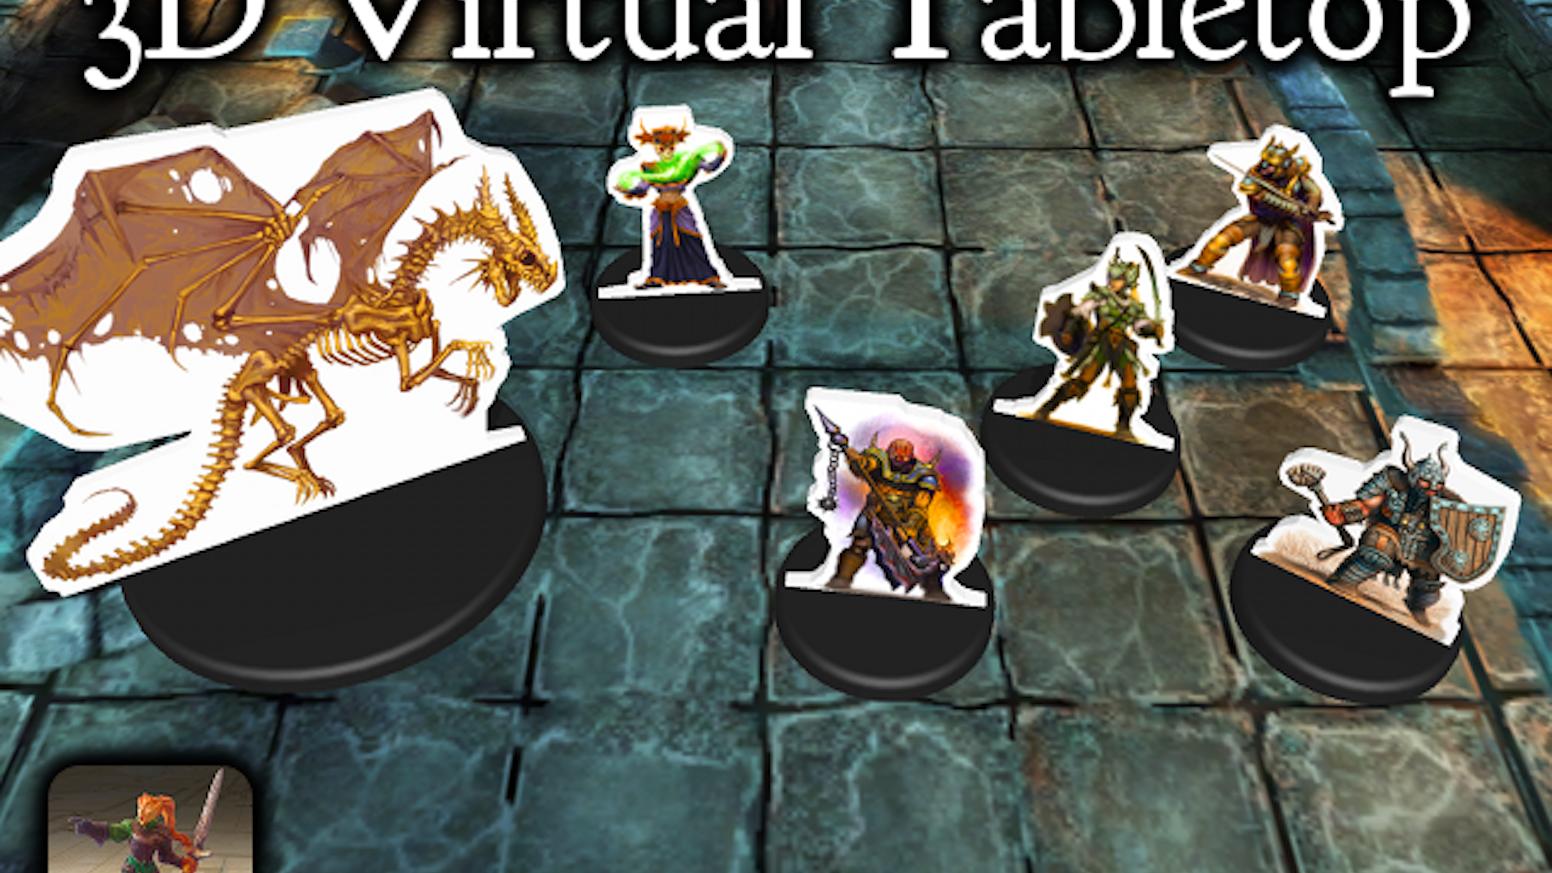 3D Virtual Tabletop: Visually Stunning RPGs on iPad, Android